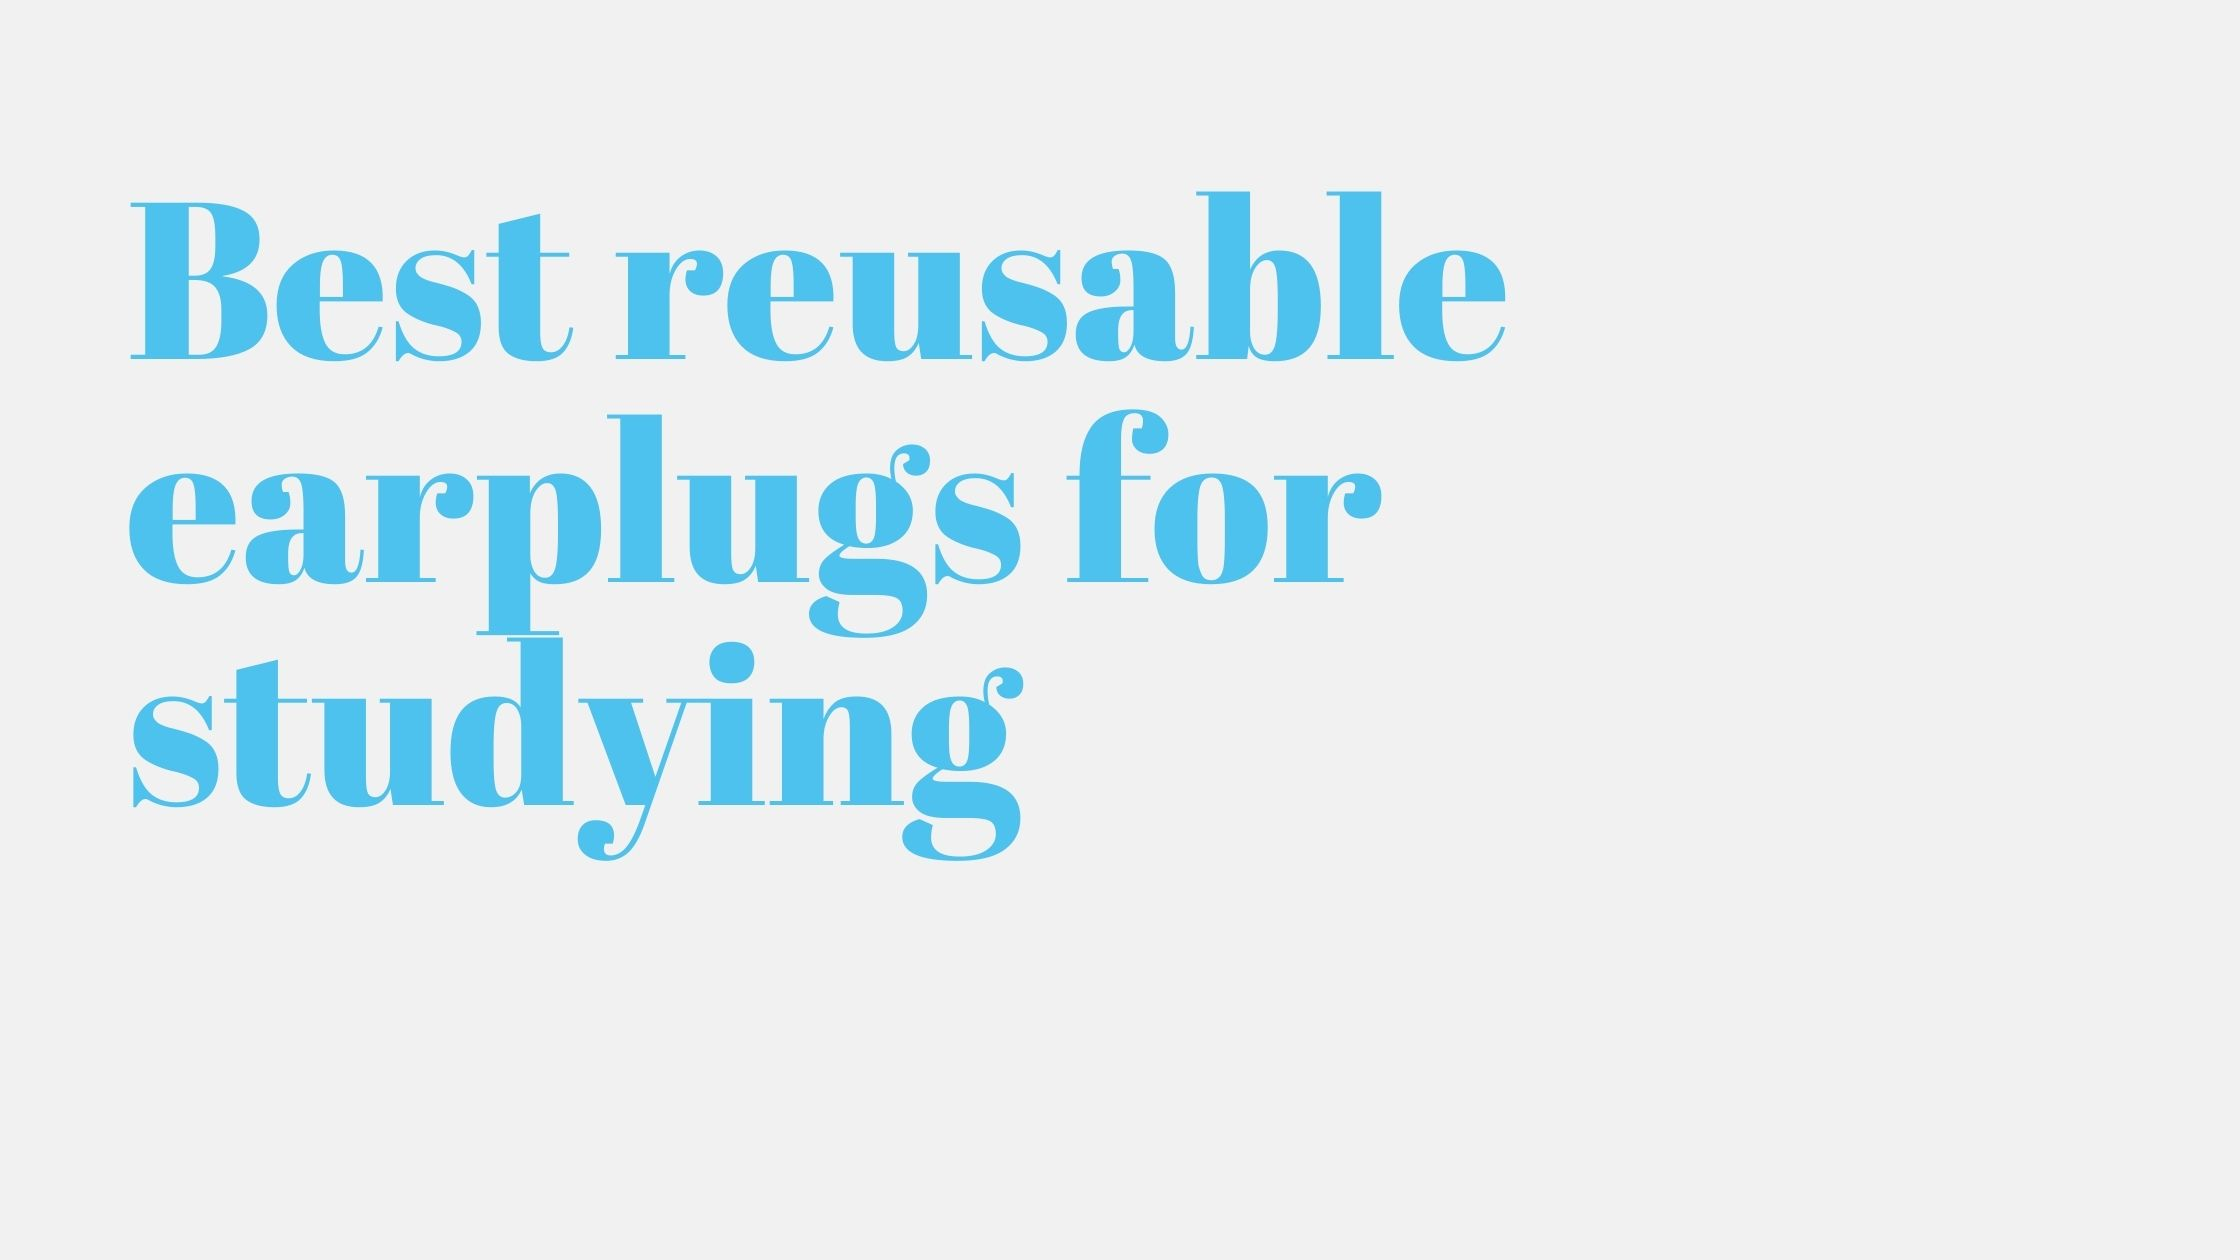 Best reusable earplugs for studying